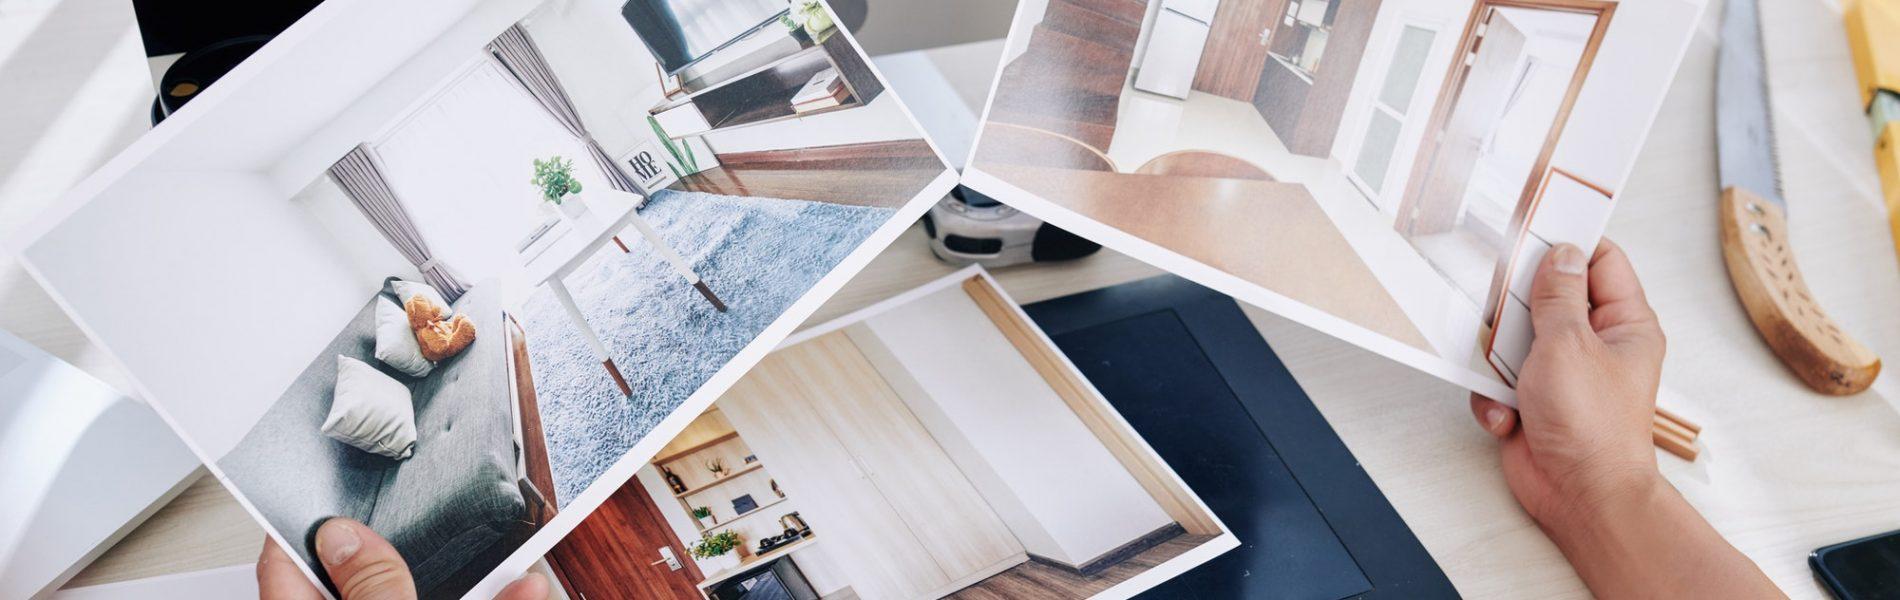 Interior designer looking at photos